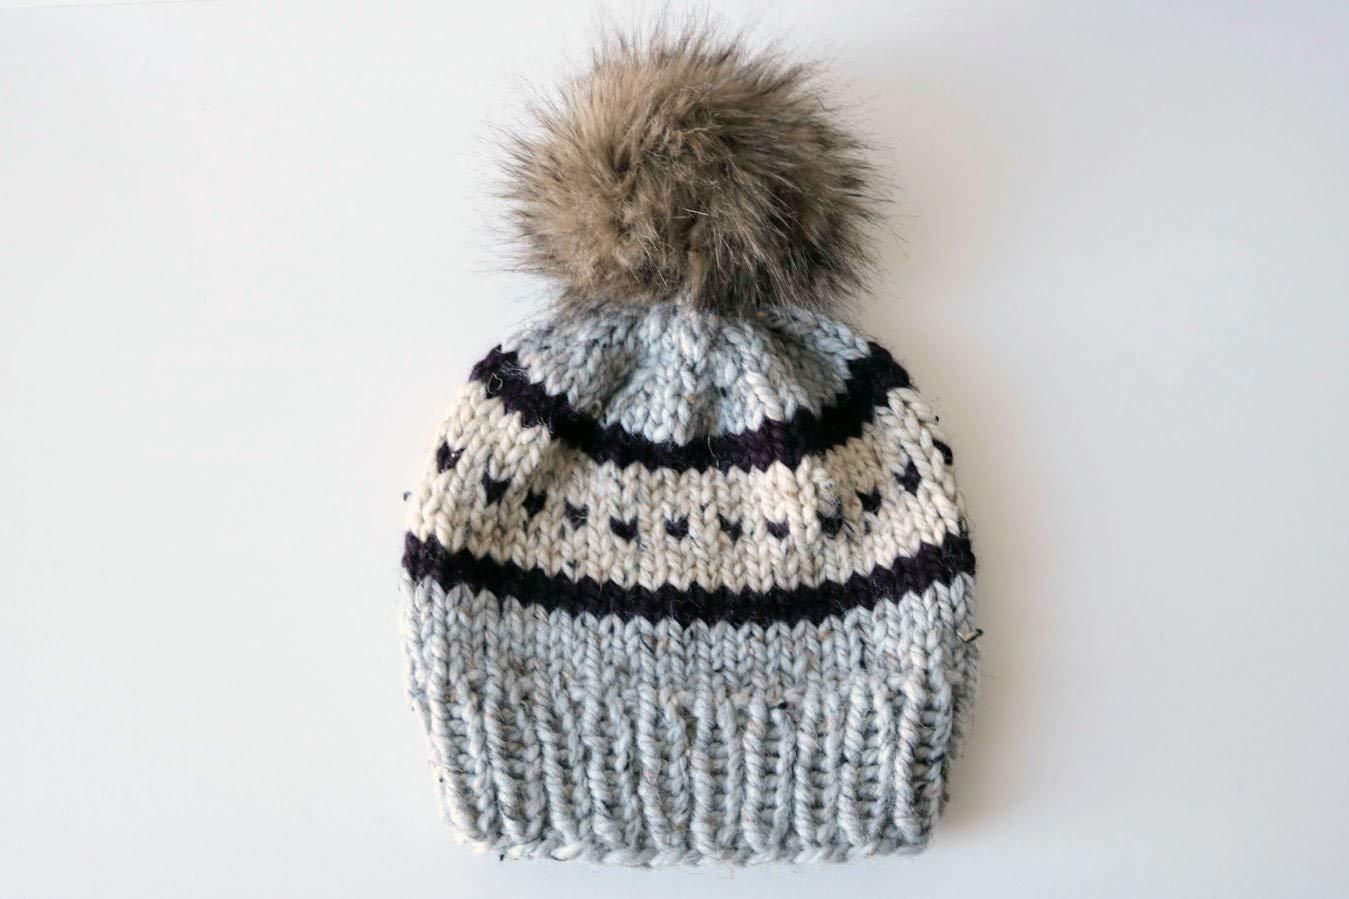 4efcb1a0 Amazon.com: Knitted Fair Isle Knit Beanie Hat with Faux Fur Pom Pom  (Adult). Handmade in Chunky, Wool Yarn. Gray Marble, Eggplant, and  Oatmeal.: Handmade